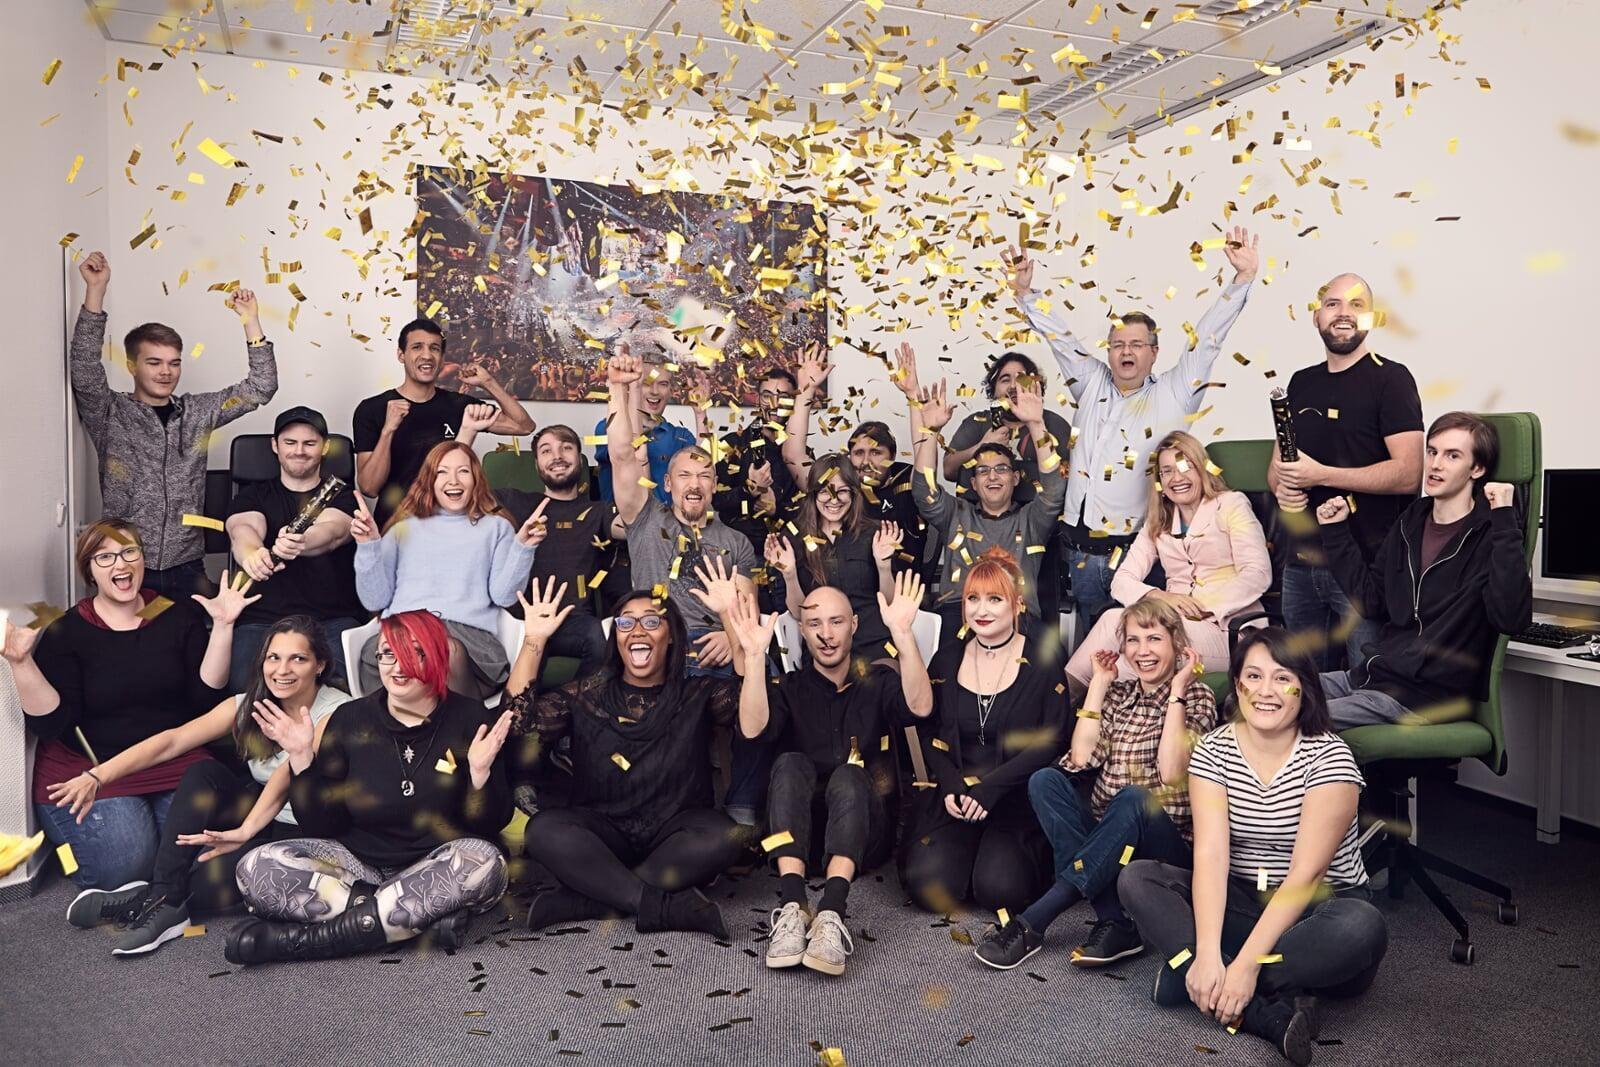 Bayes Esports team celebrating with confetti